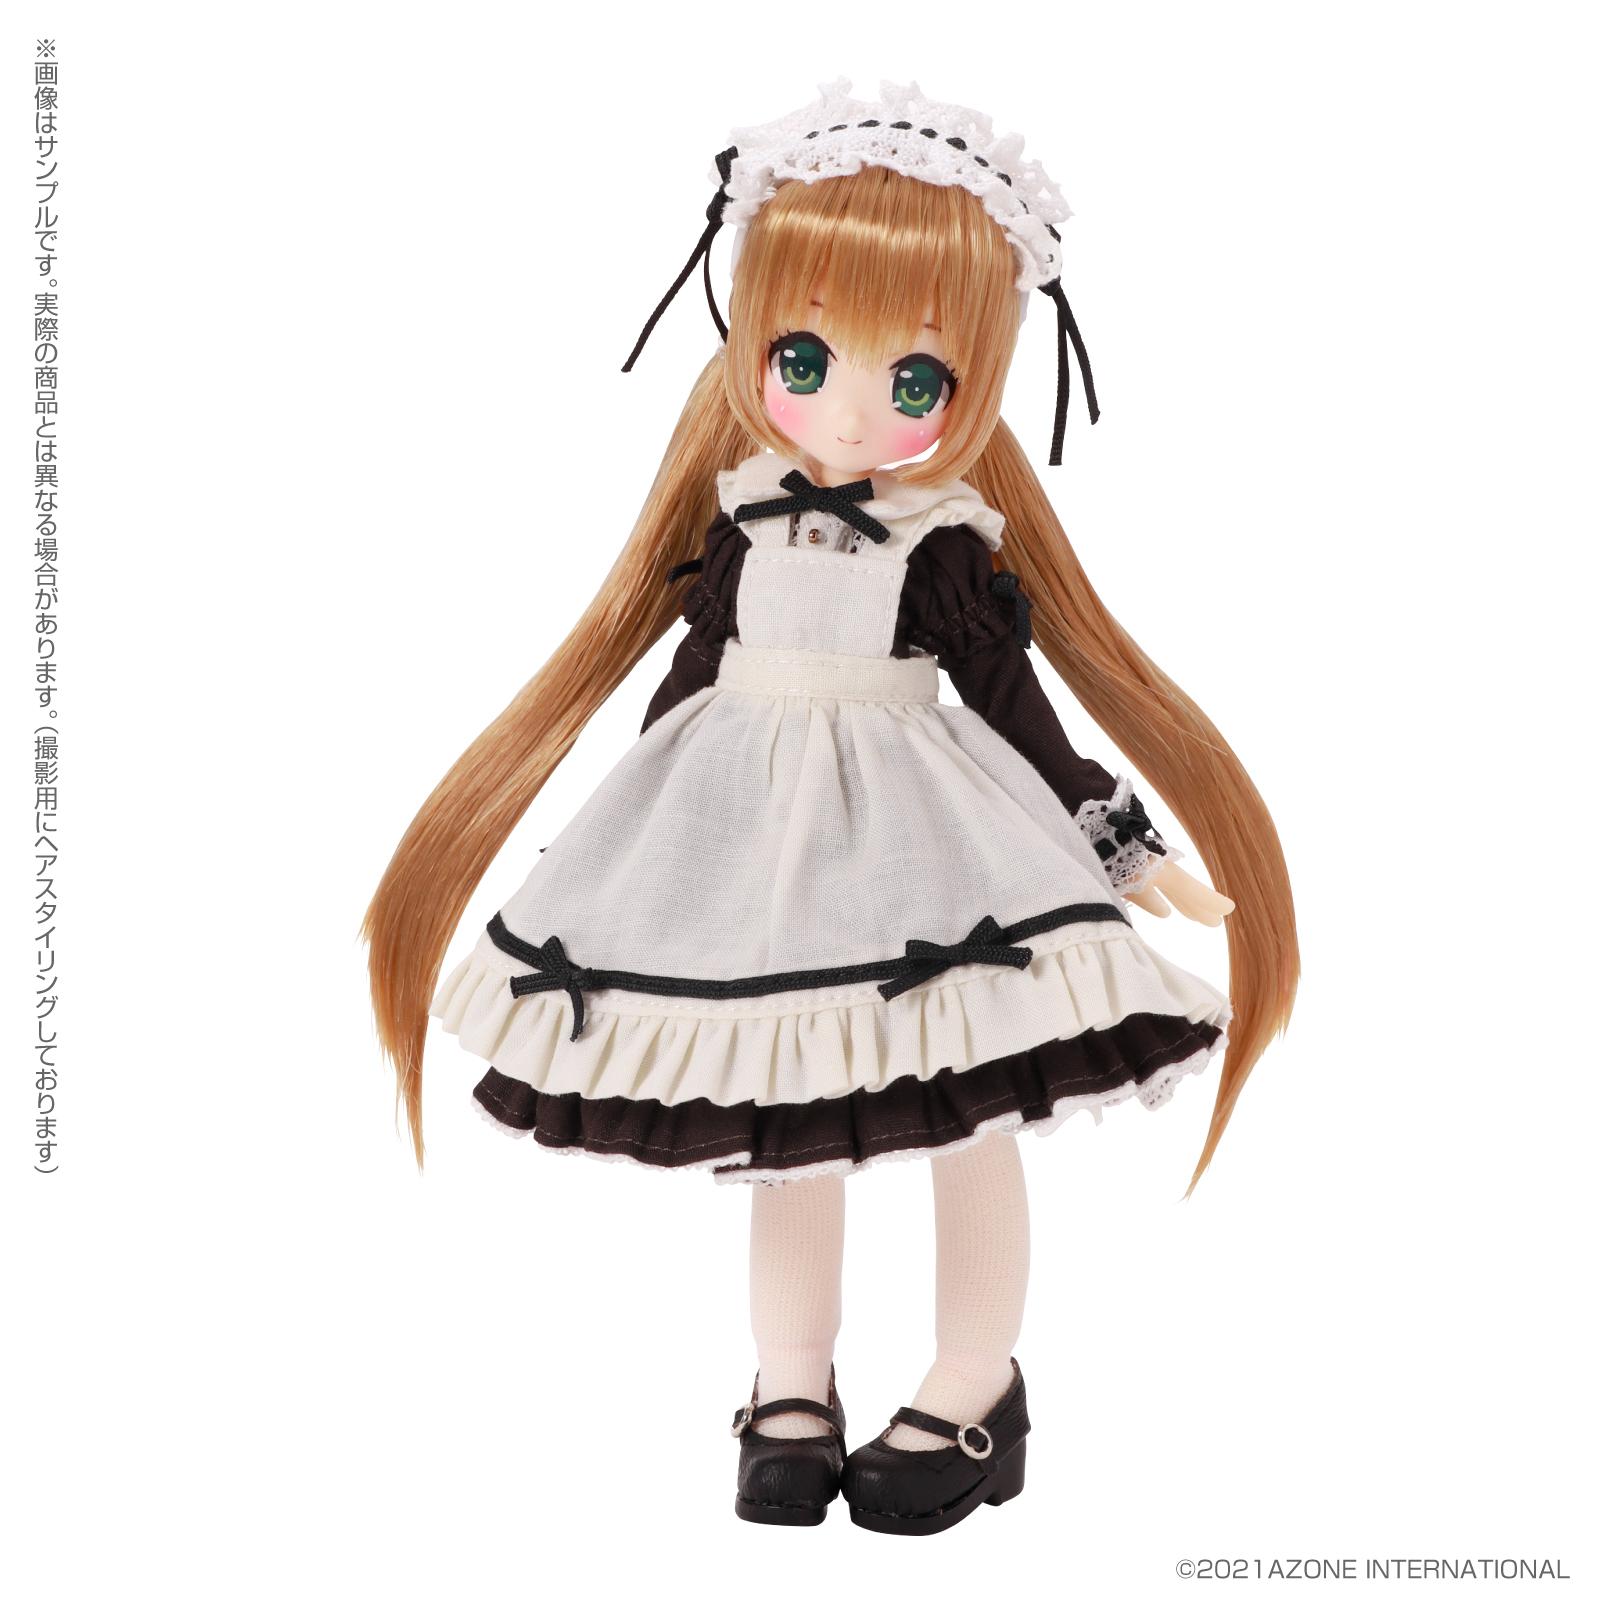 Lil'Fairy ~ちいさなお手伝いさん~『リプー 7th anniv.(ノーマル口ver.)』1/12 完成品ドール-018